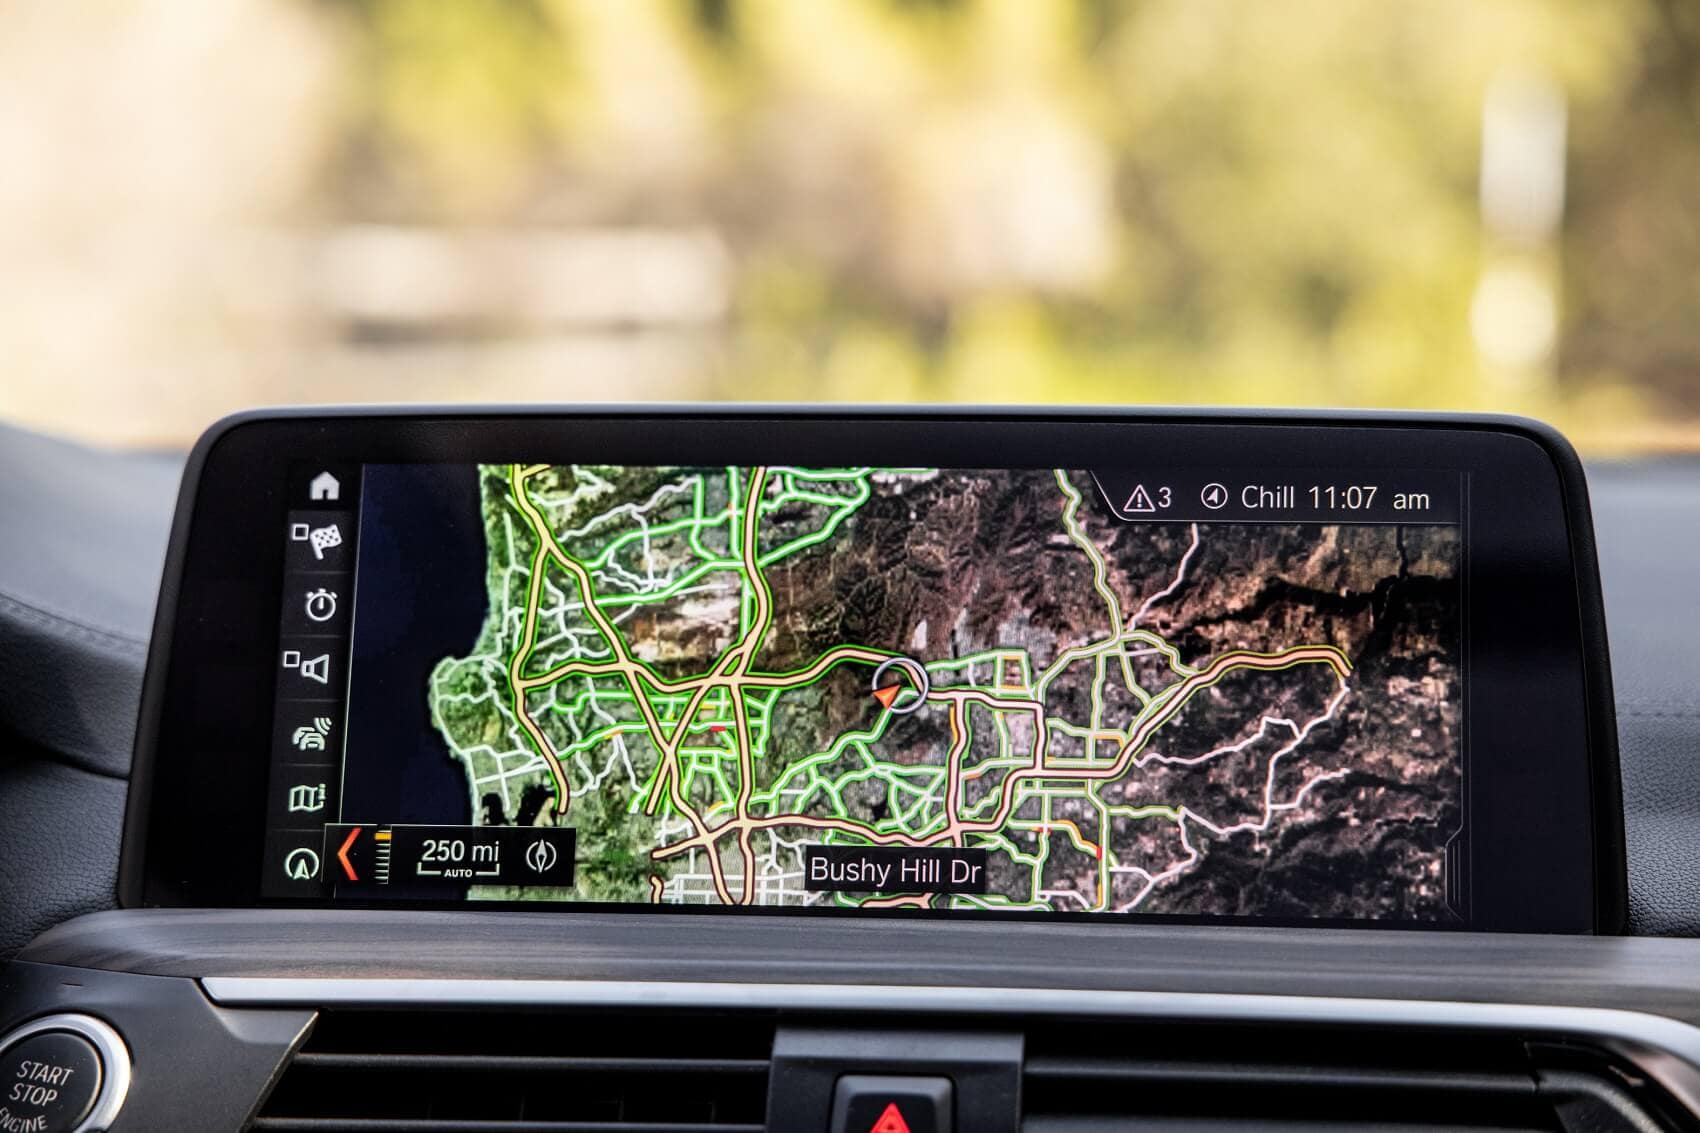 BMW X3 Navigation